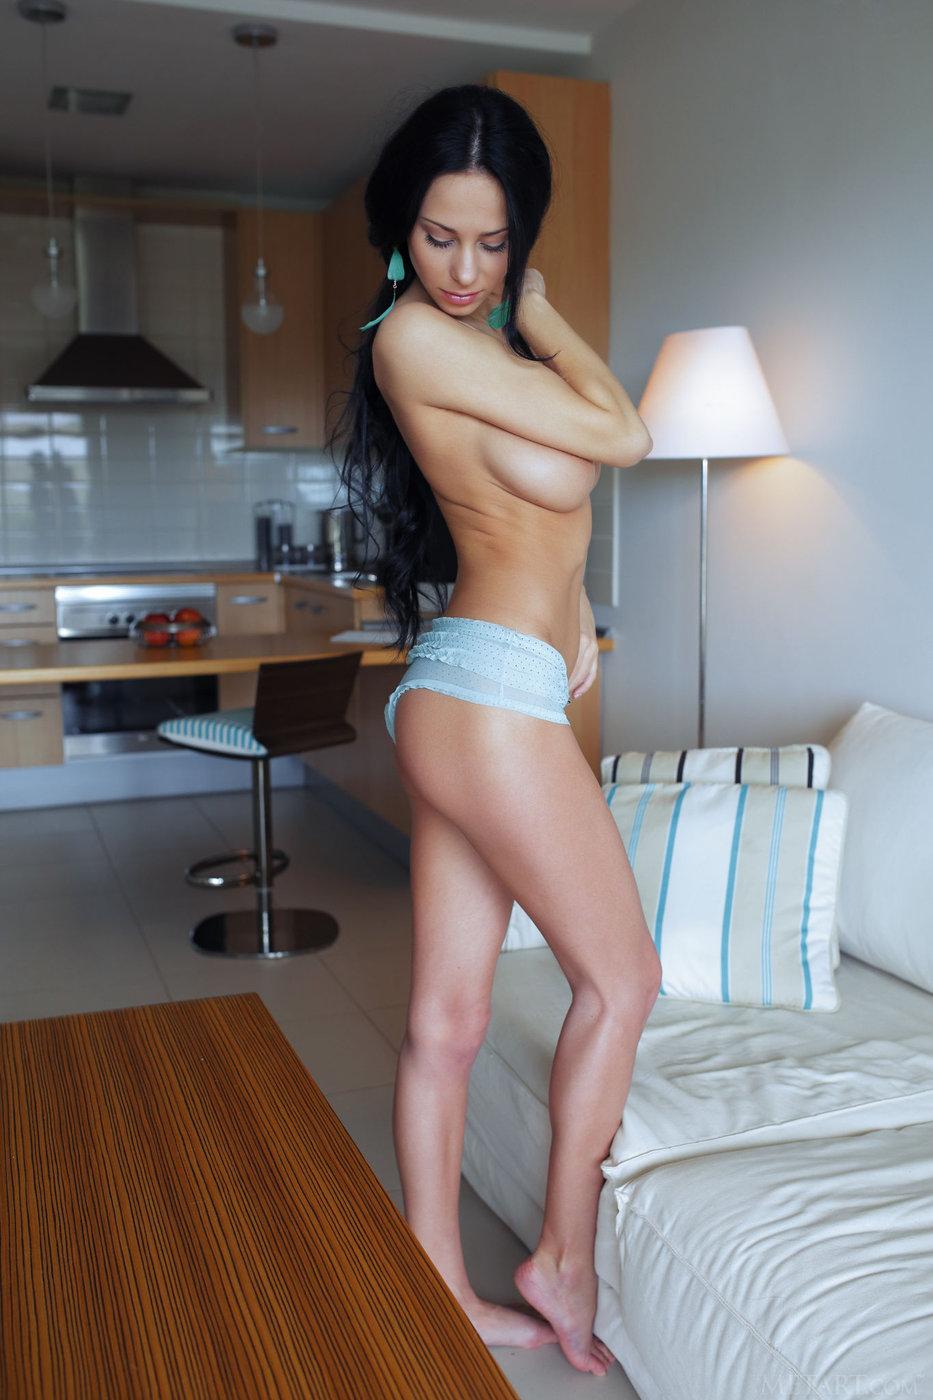 legs naked pics